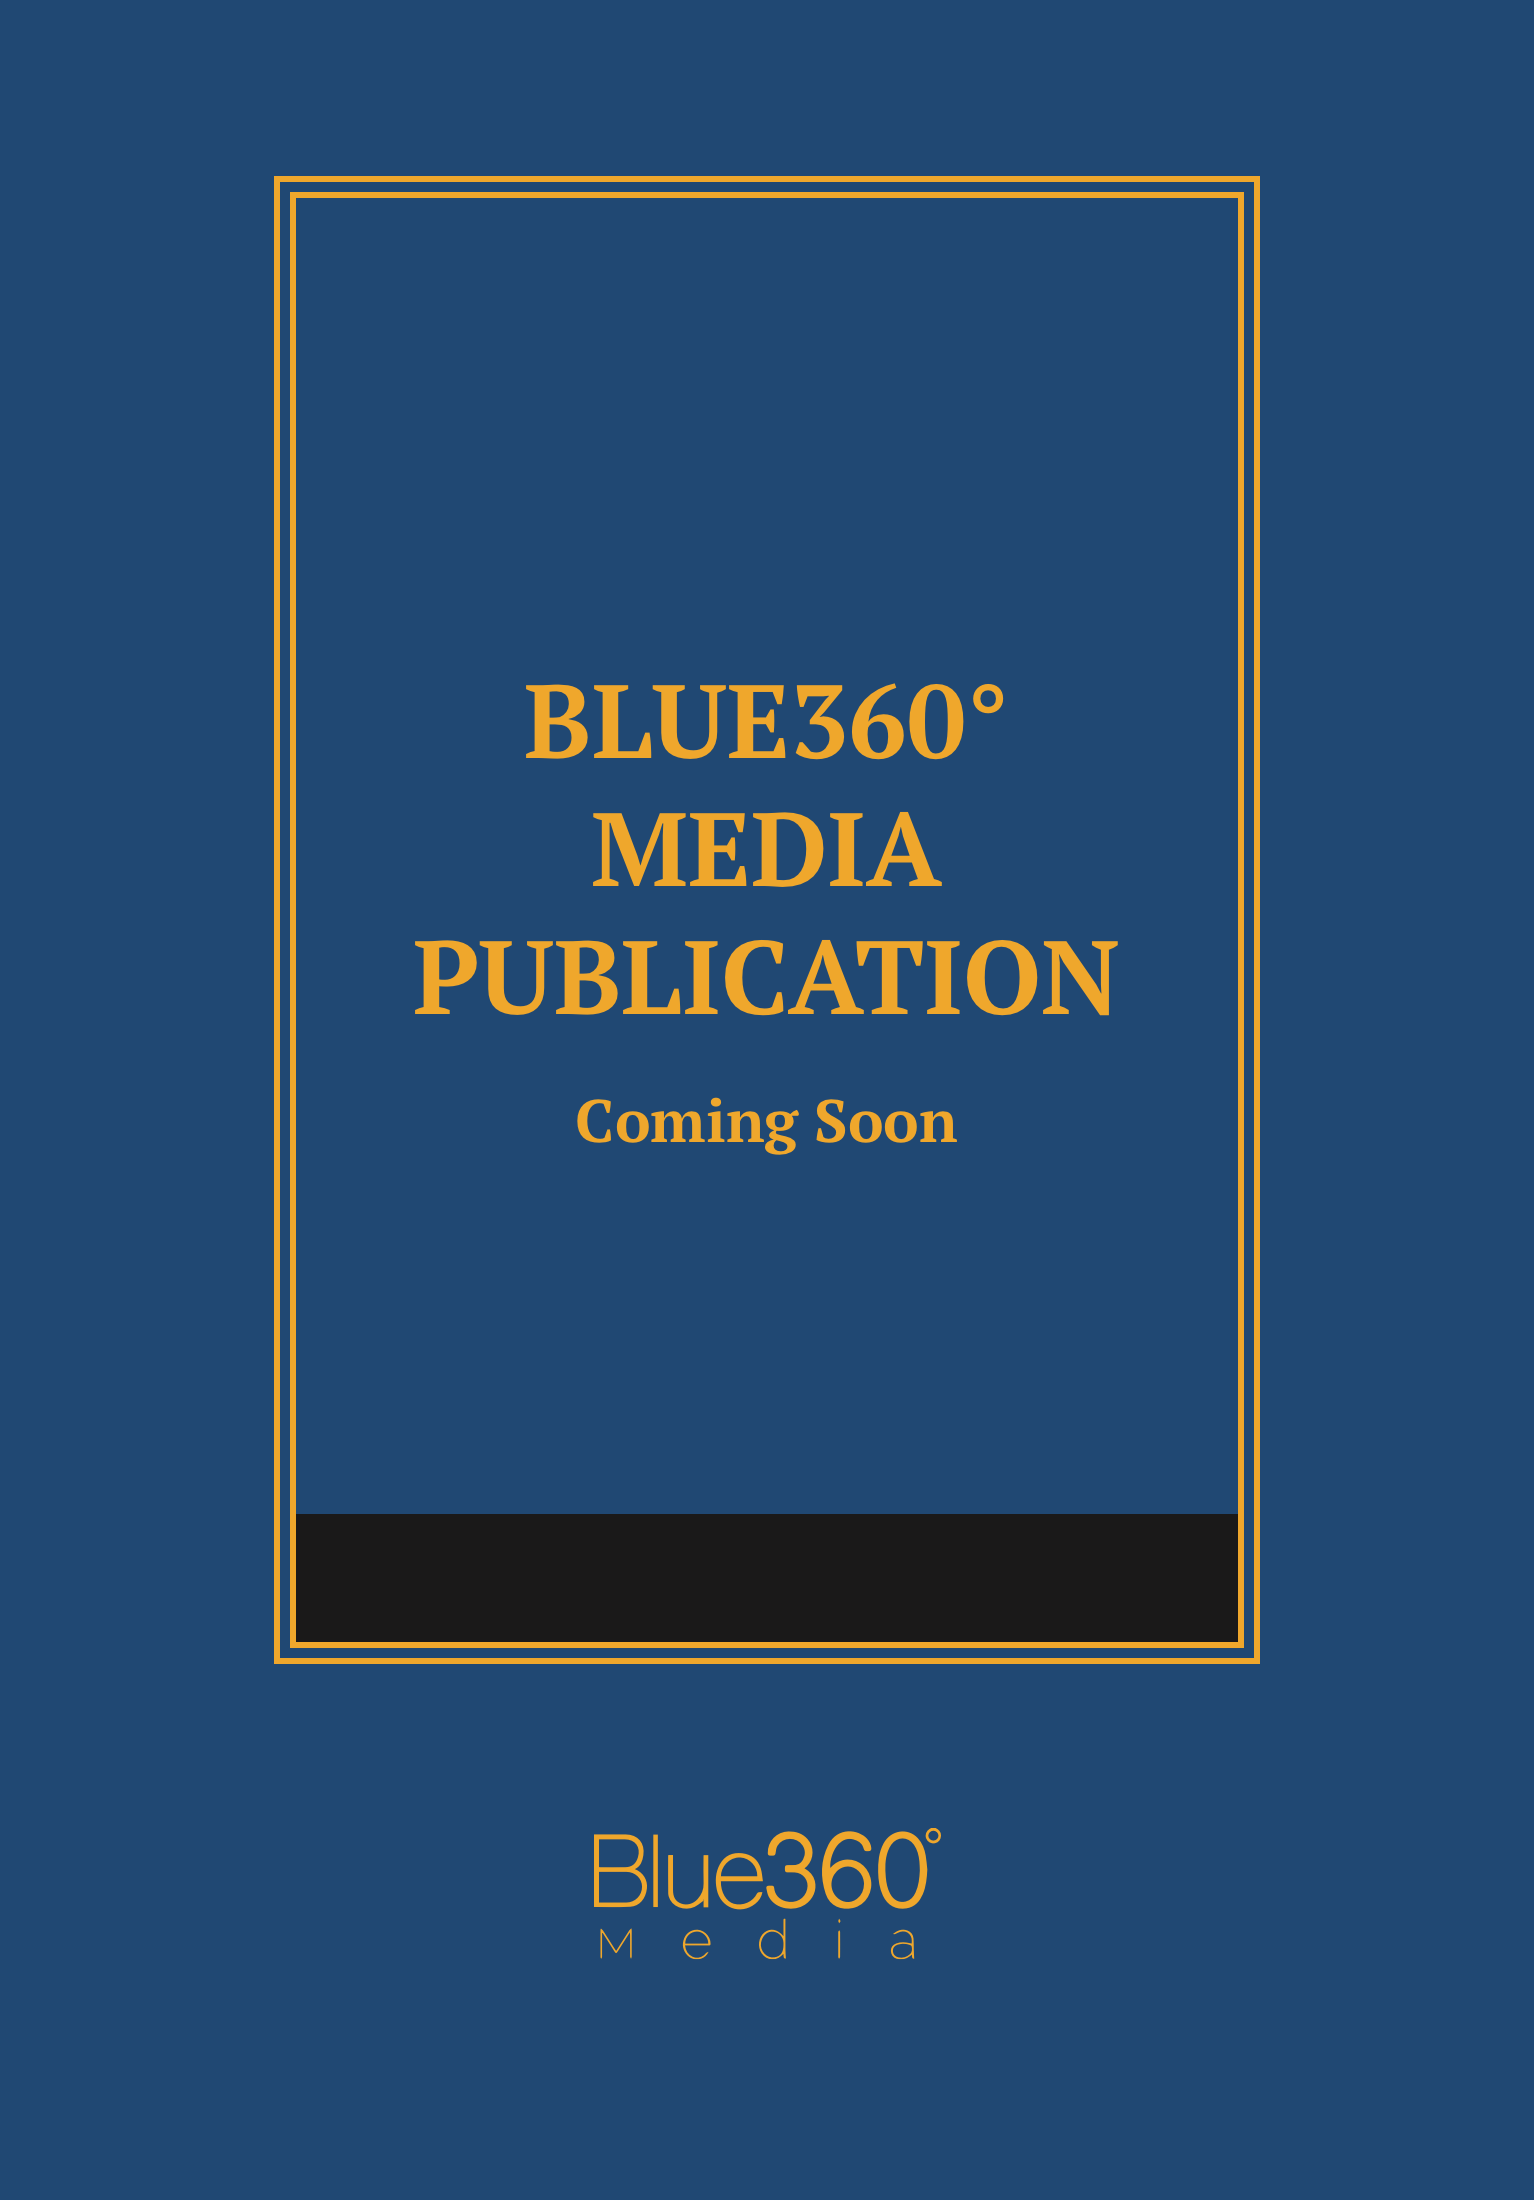 Georgia Criminal and Traffic Law Manual - 2019-2020 Edition Pre-Order